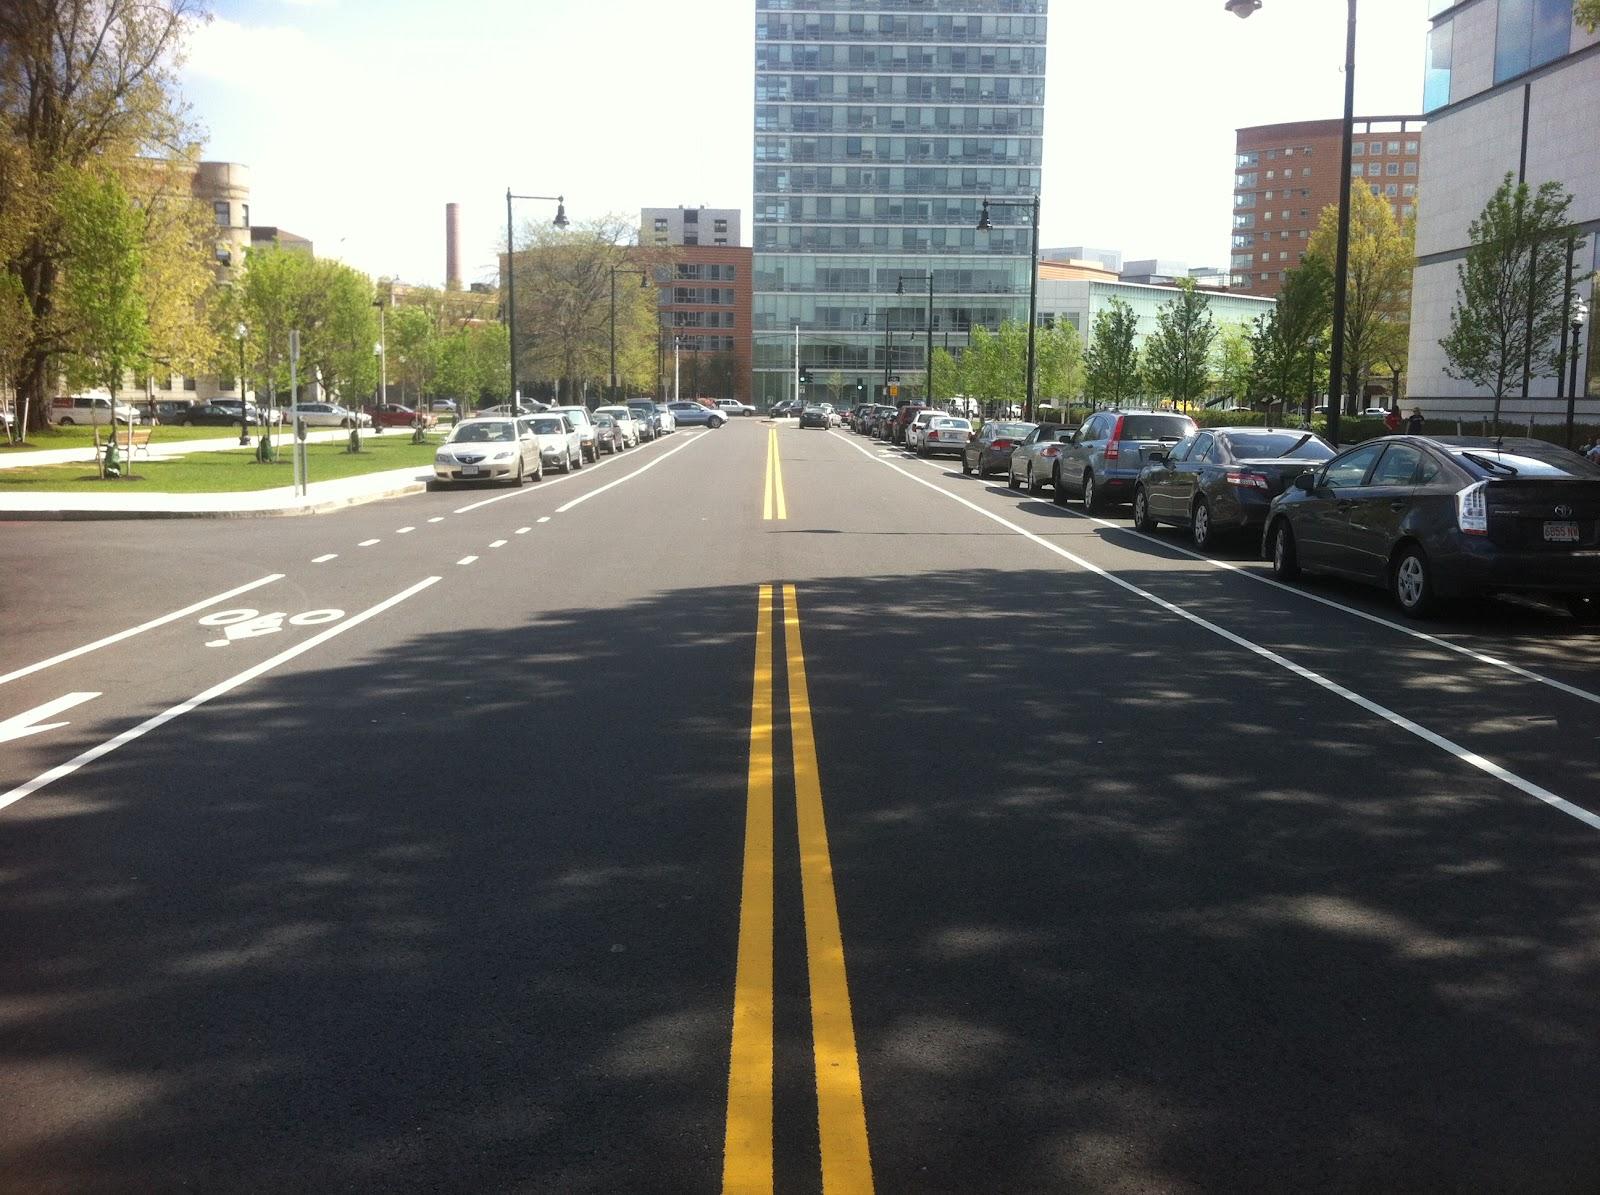 Used Cars Bay Area >> Calm Streets Boston: Shared Lanes & Bike Lanes - MFA, Back Bay Fens Area